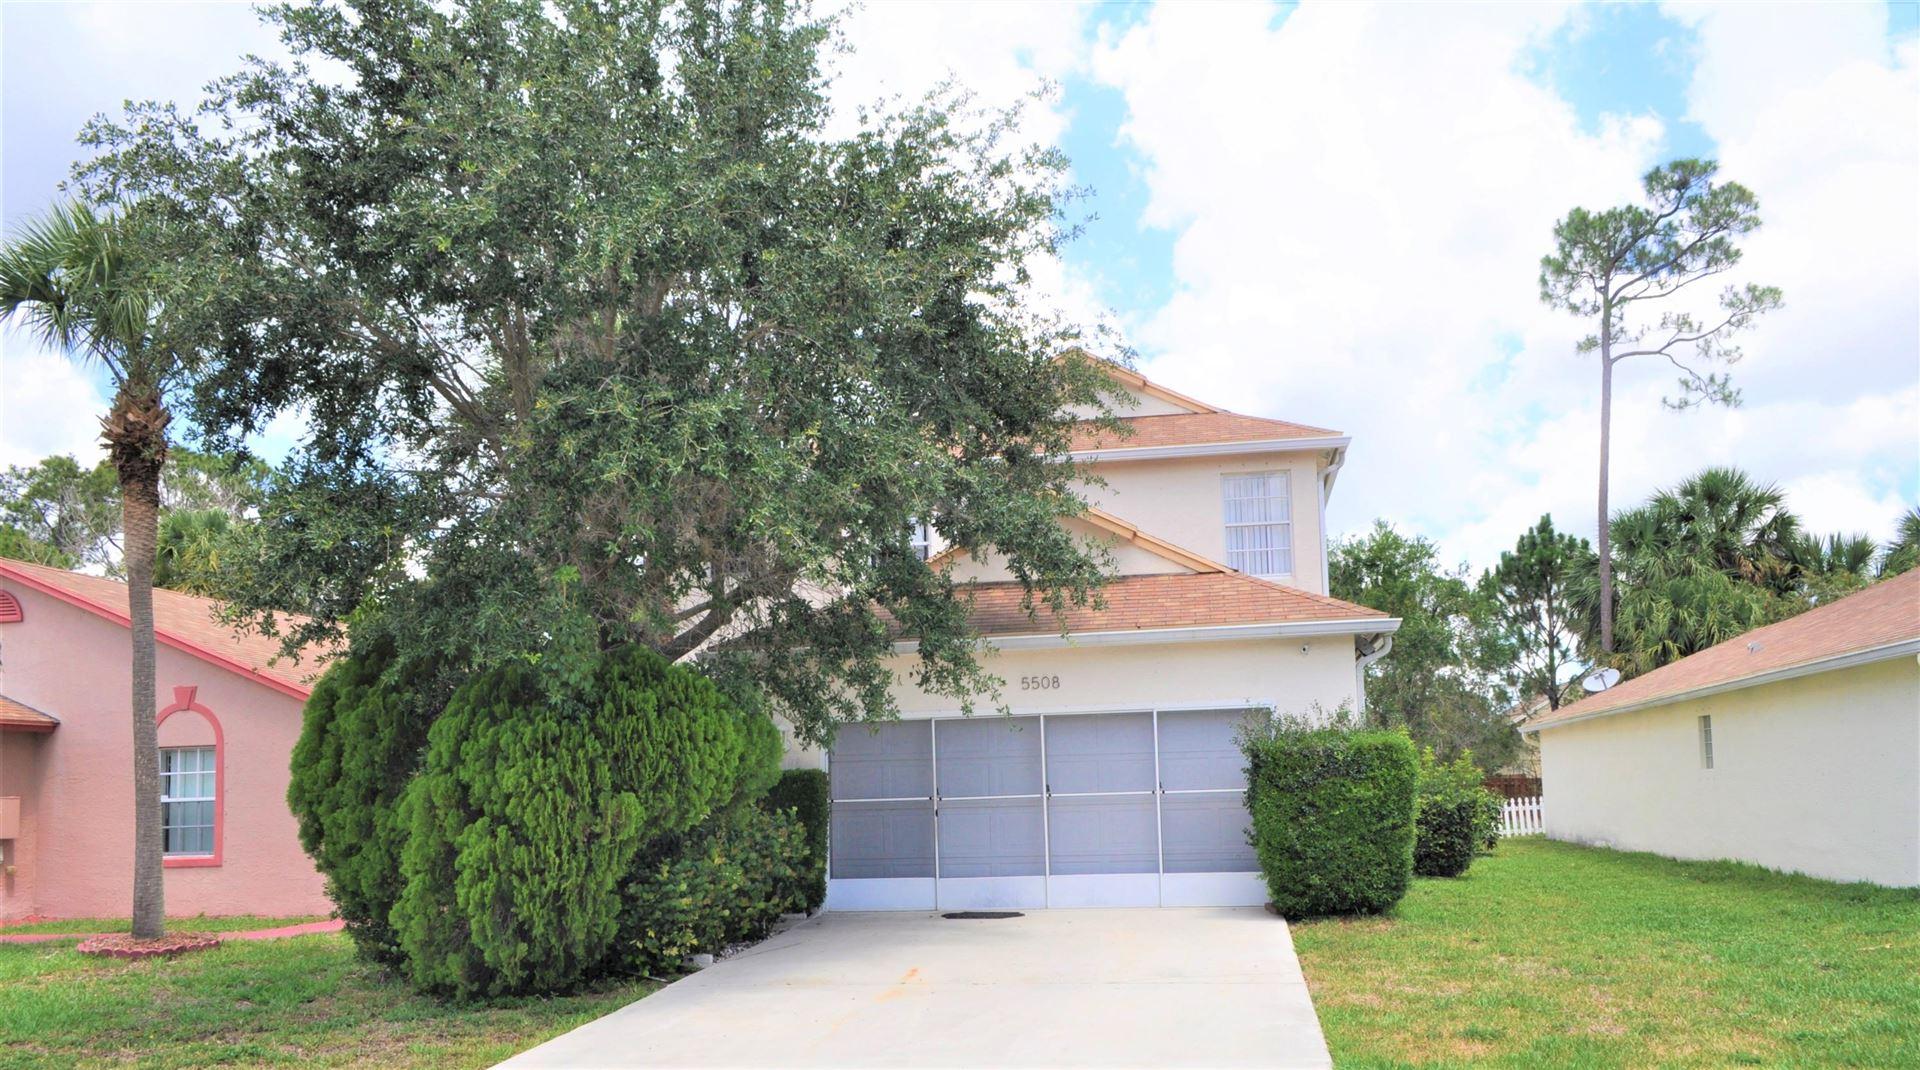 5508 Azalea Circle, West Palm Beach, FL 33415 - MLS#: RX-10715253